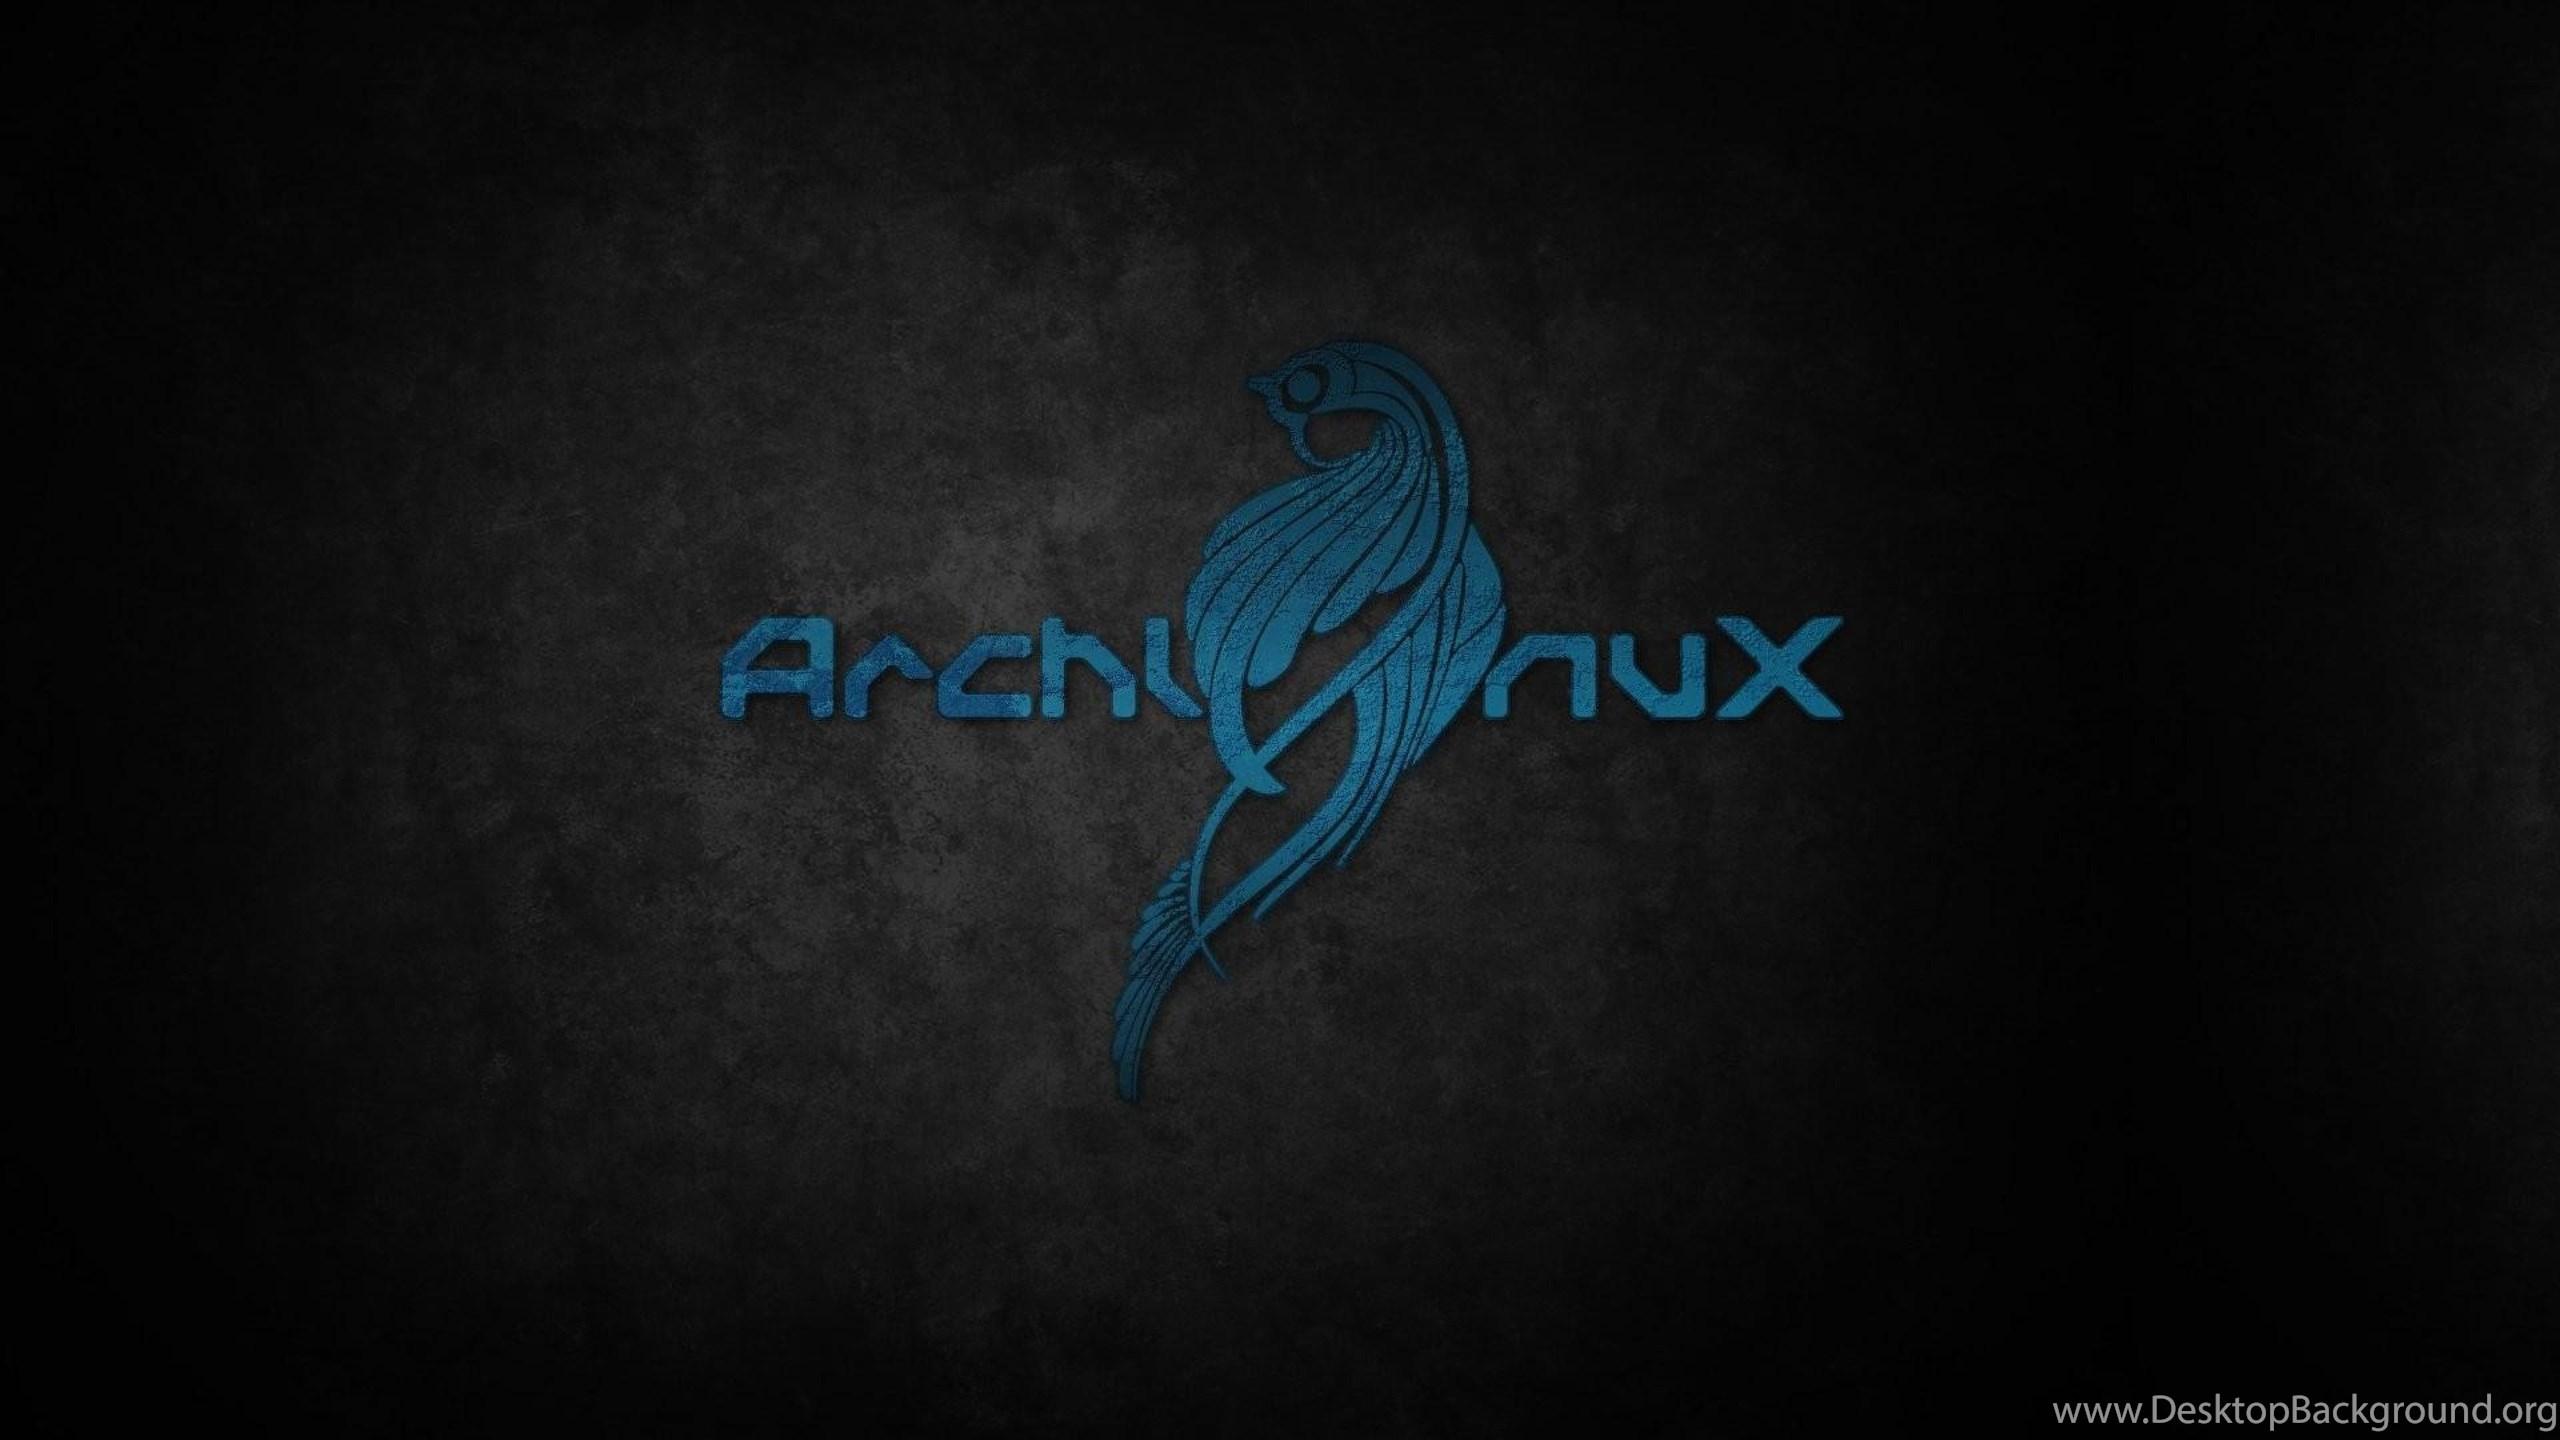 Linux Arch Linux Hd Wallpapers Desktop Backgrounds Mobile Desktop Background